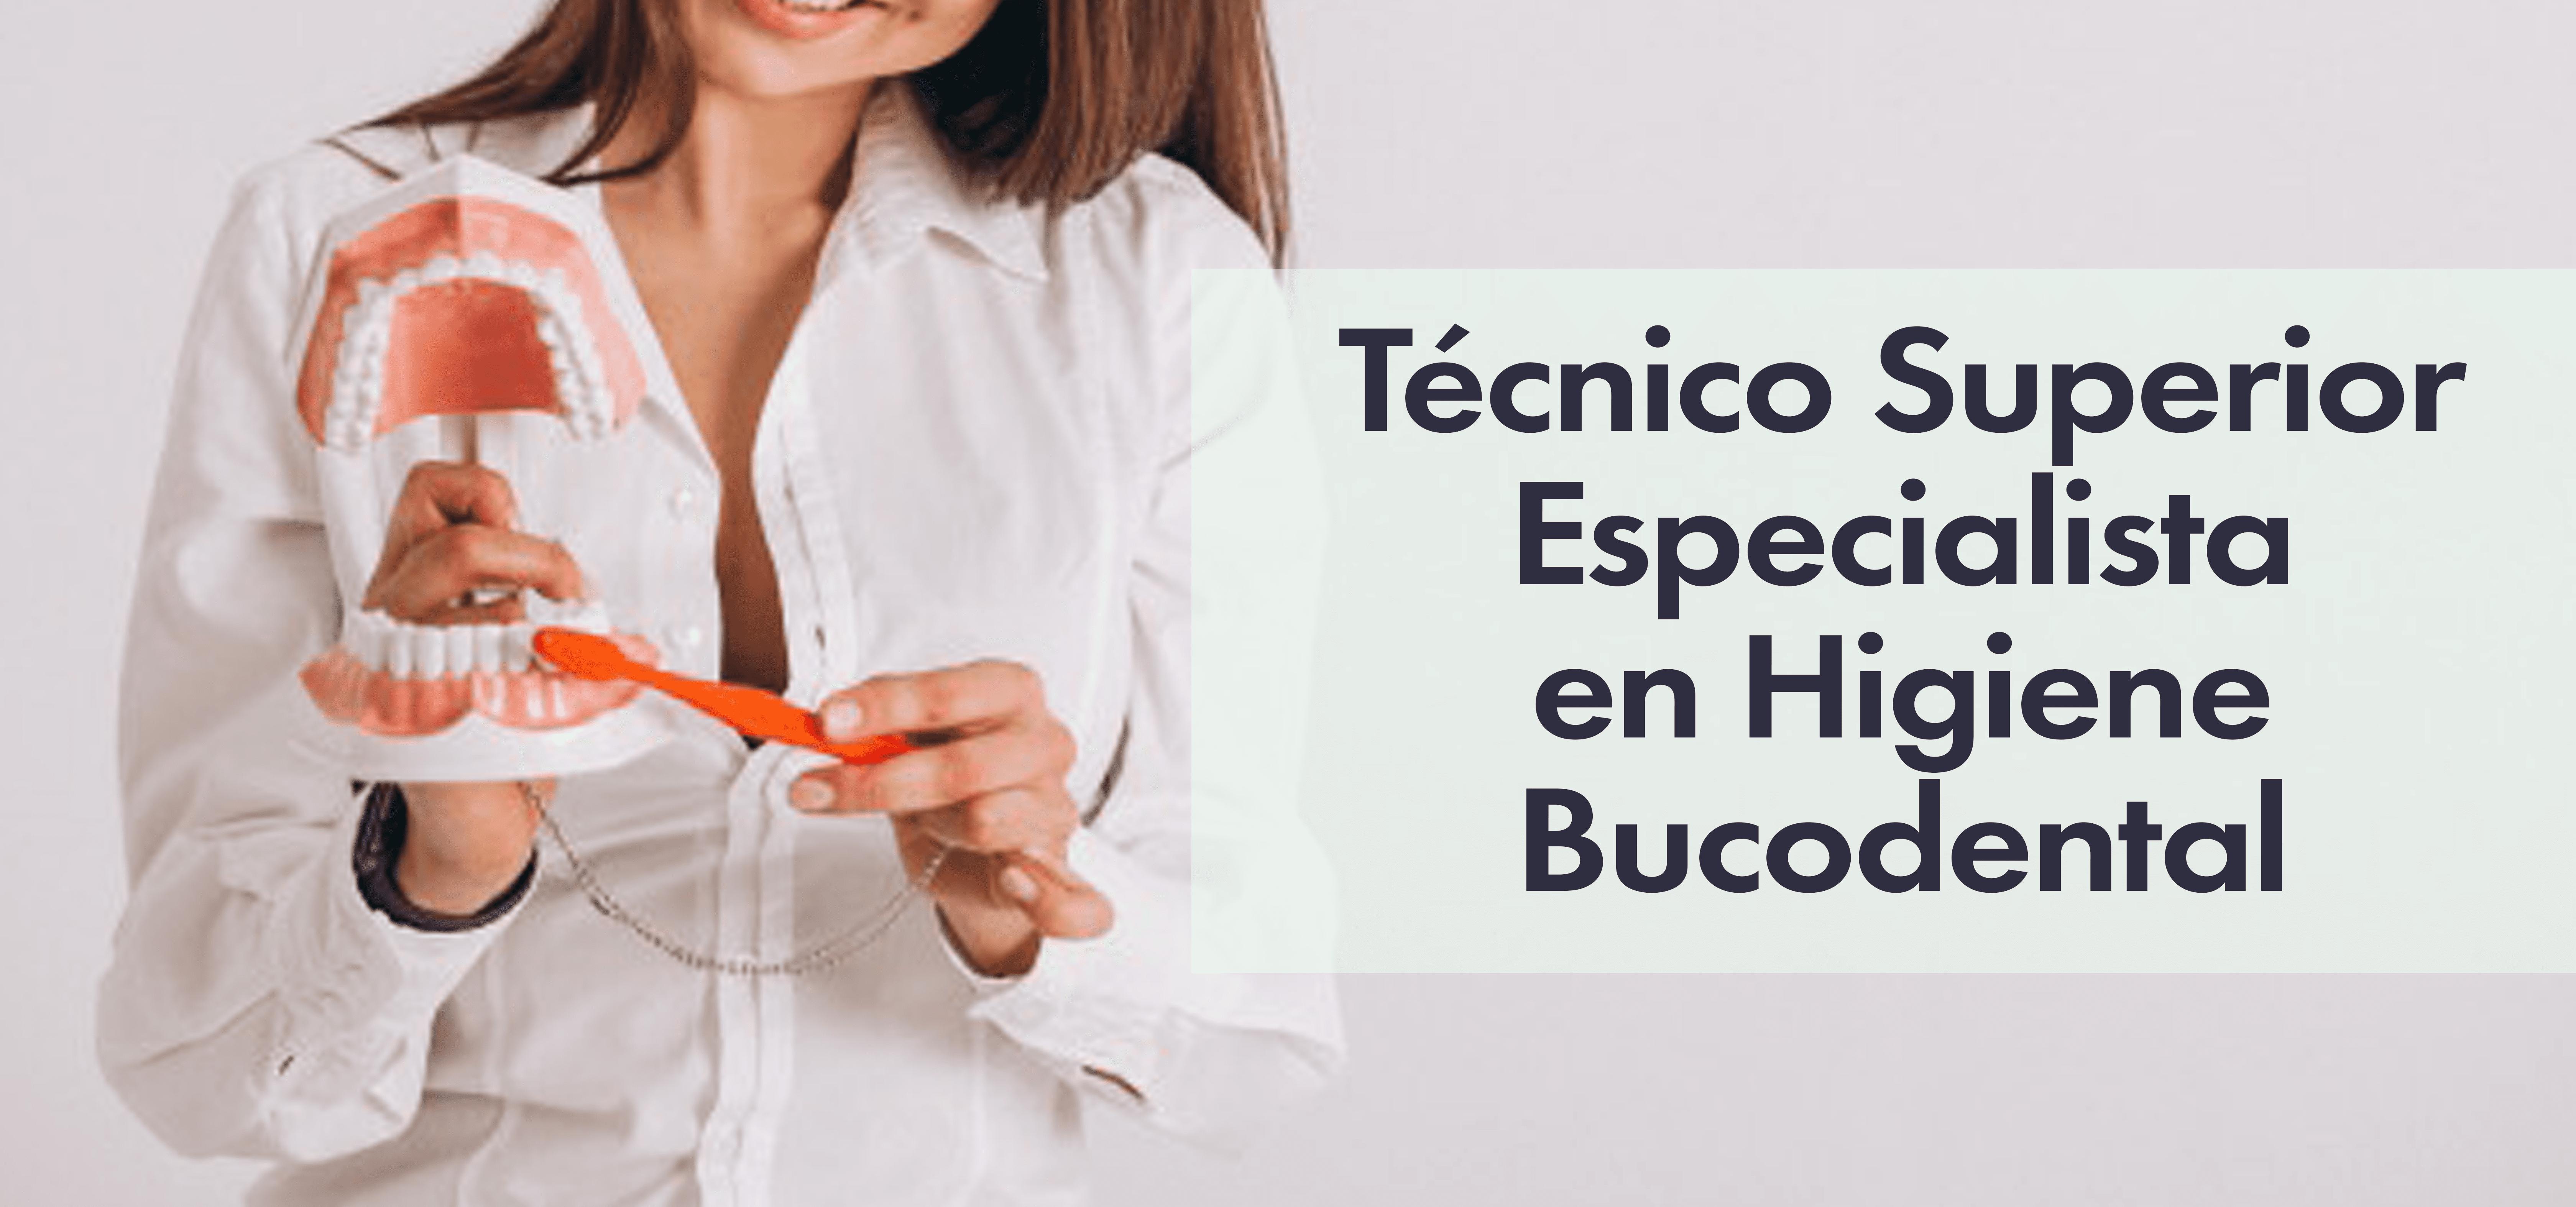 Técnico Superior Especialista en Higiene Bucodental